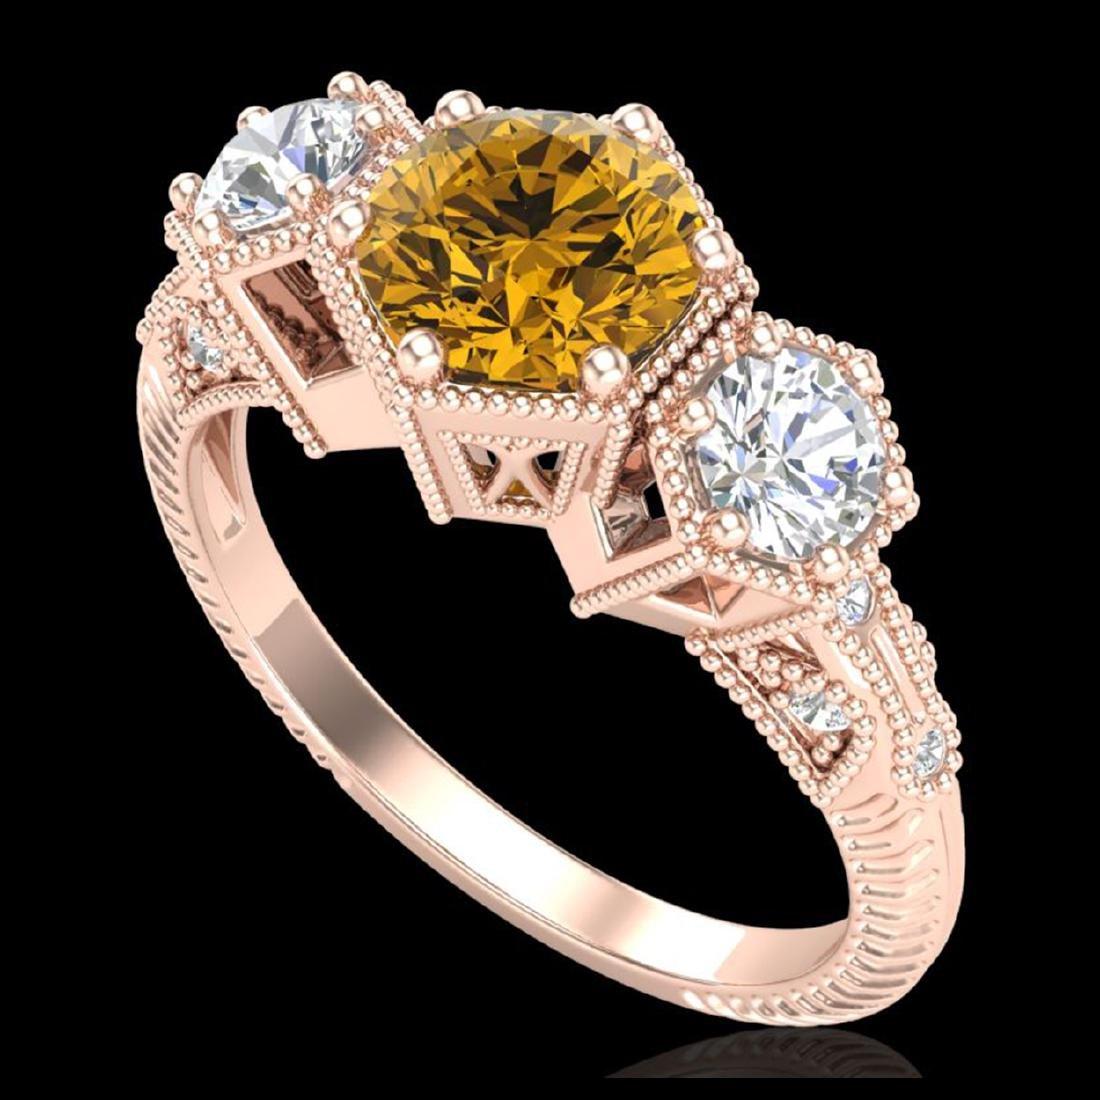 1.66 ctw Intense Fancy Yellow Diamond Art Deco Ring 18K